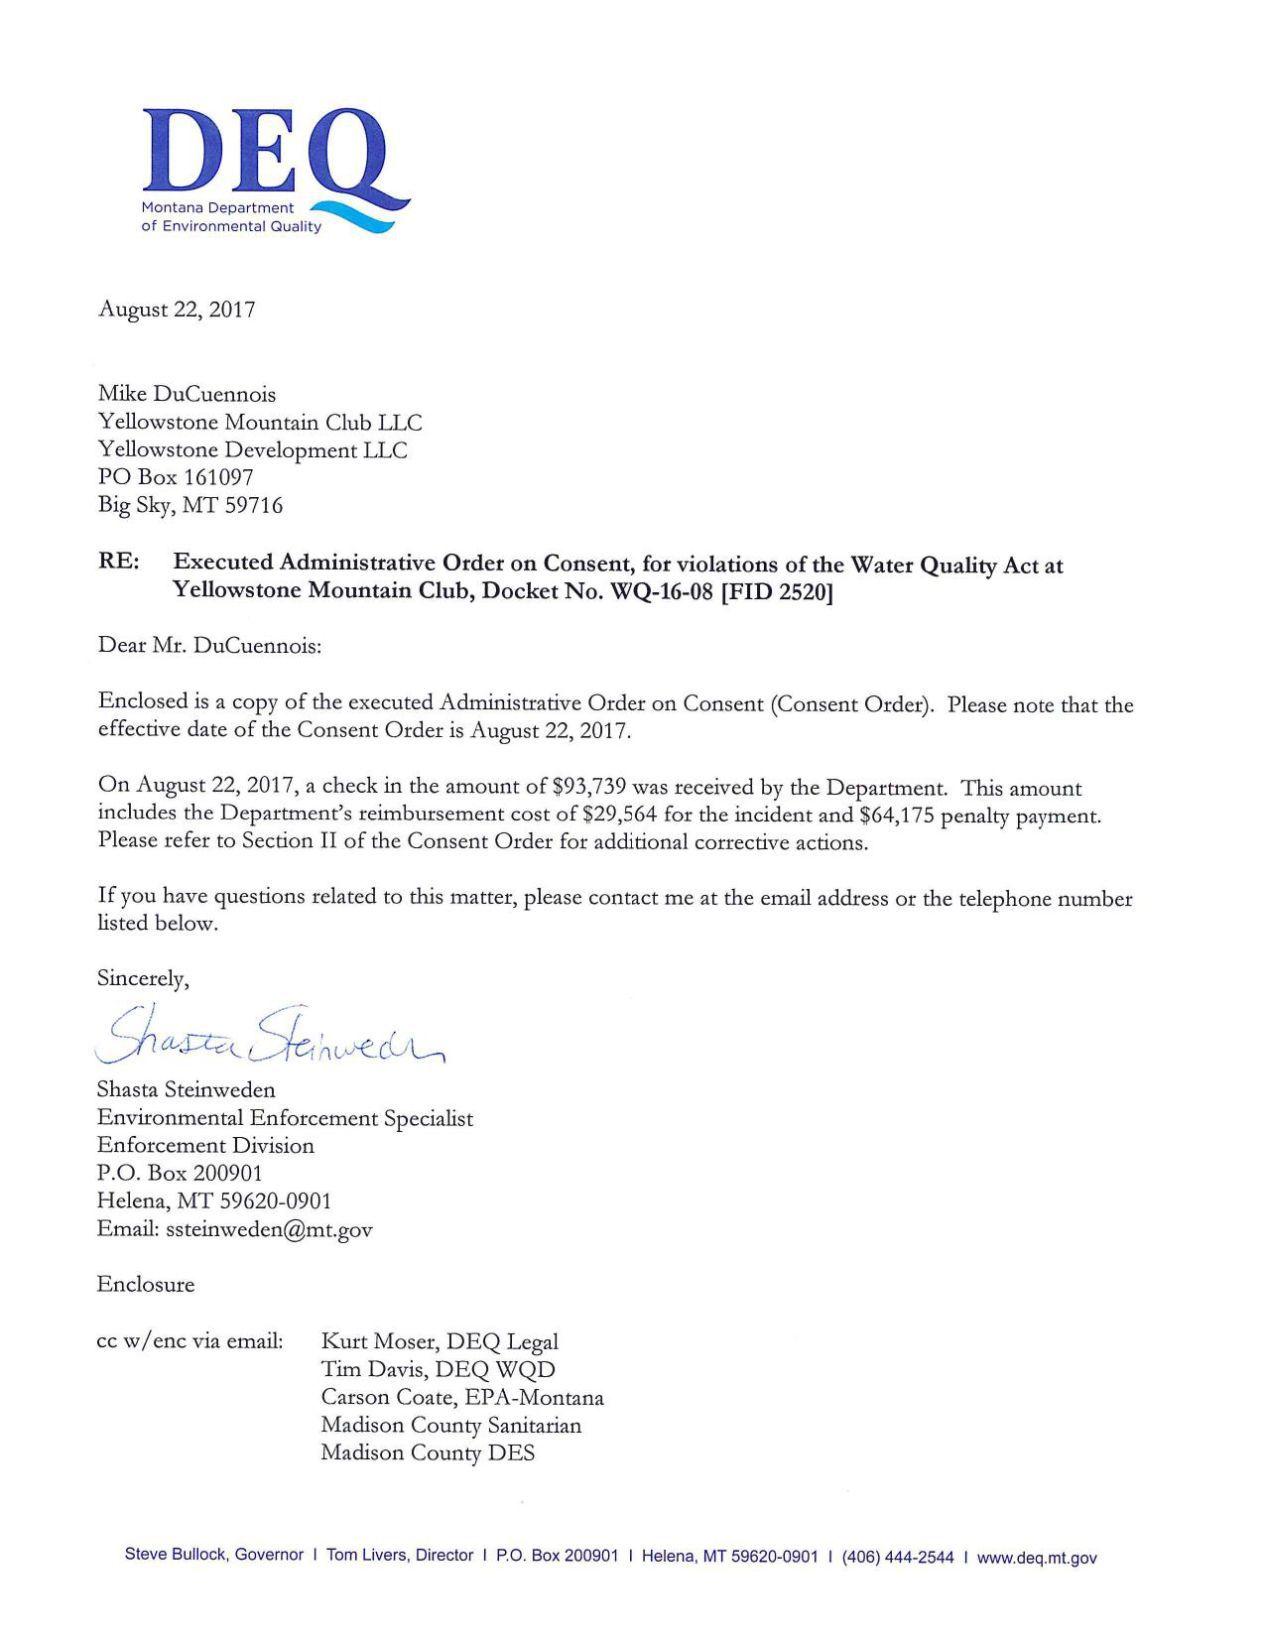 Deq Letter To Yellowstone Club Bozemandailychronicle Com